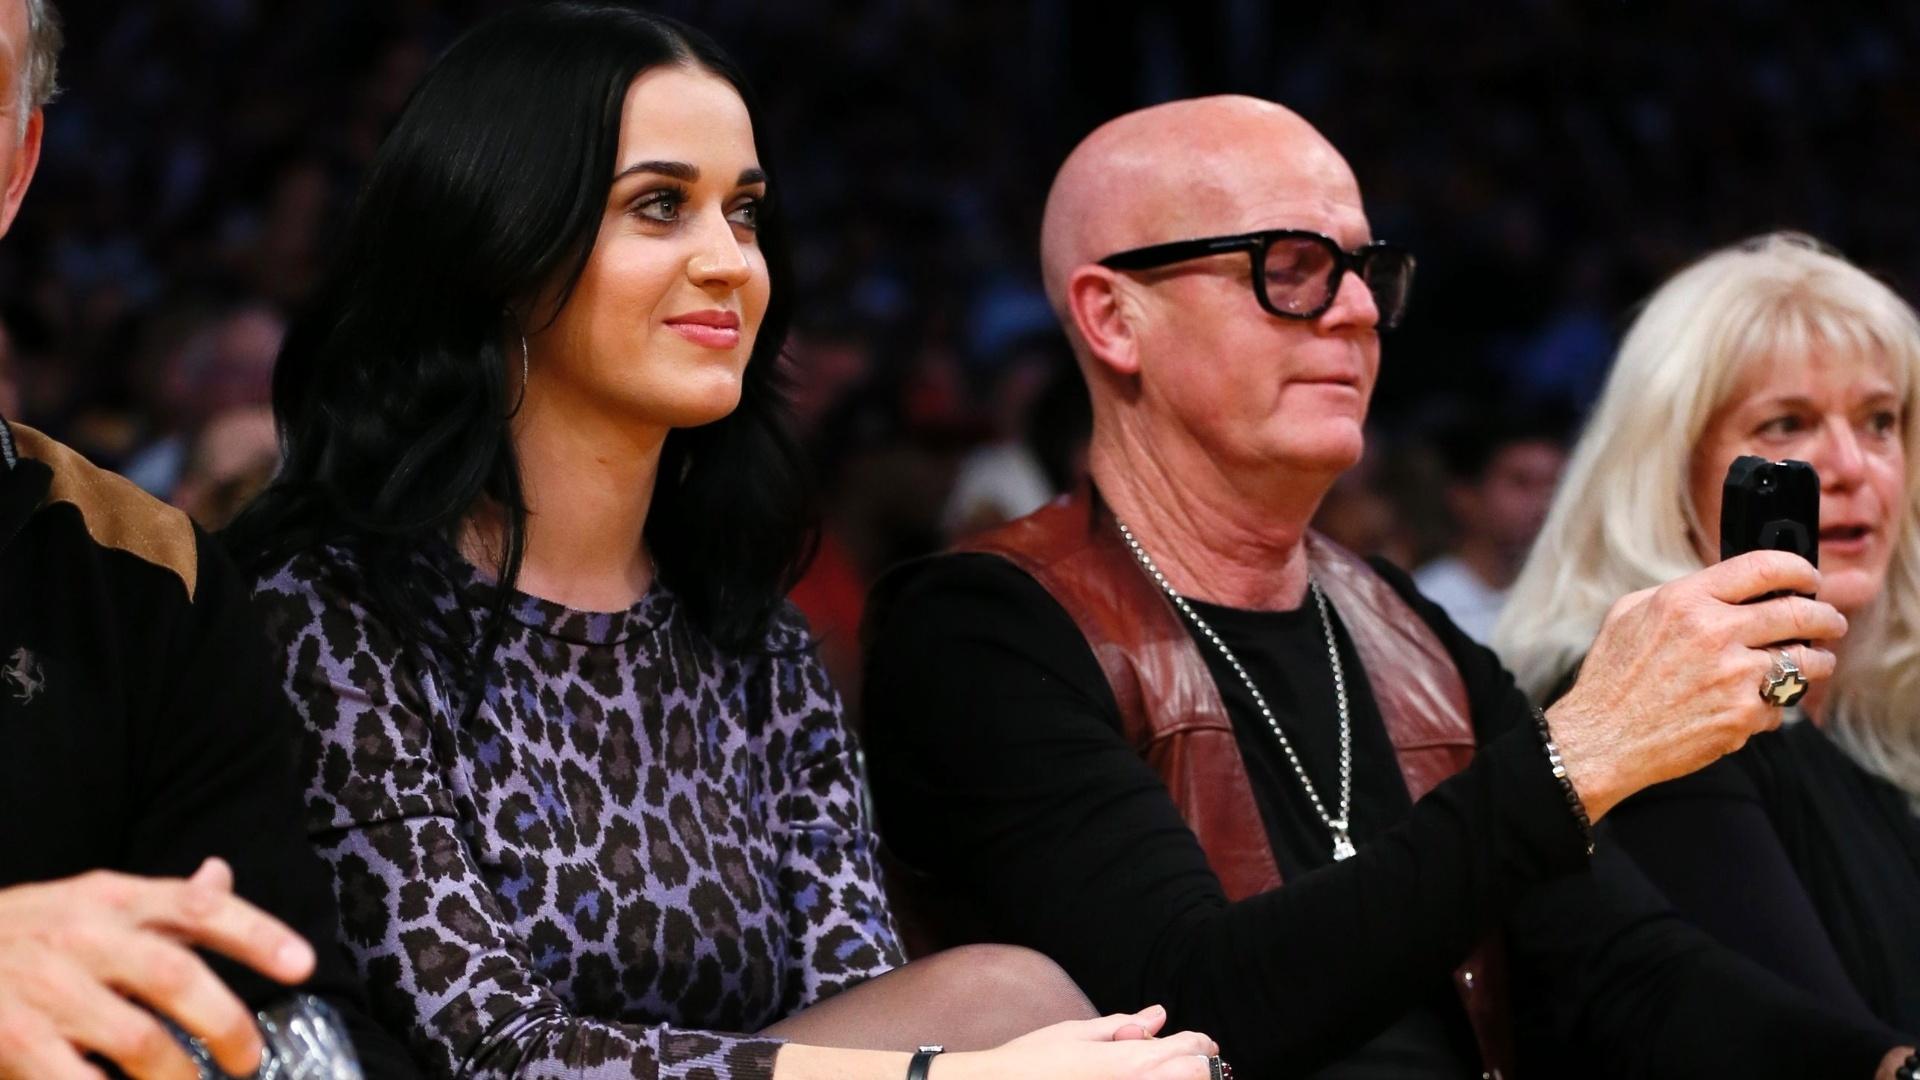 Cantora Katy Perry acompanha a partida entre Los Angeles Lakers e Dallas Mavericks na abertura da NBA (30/10/12)